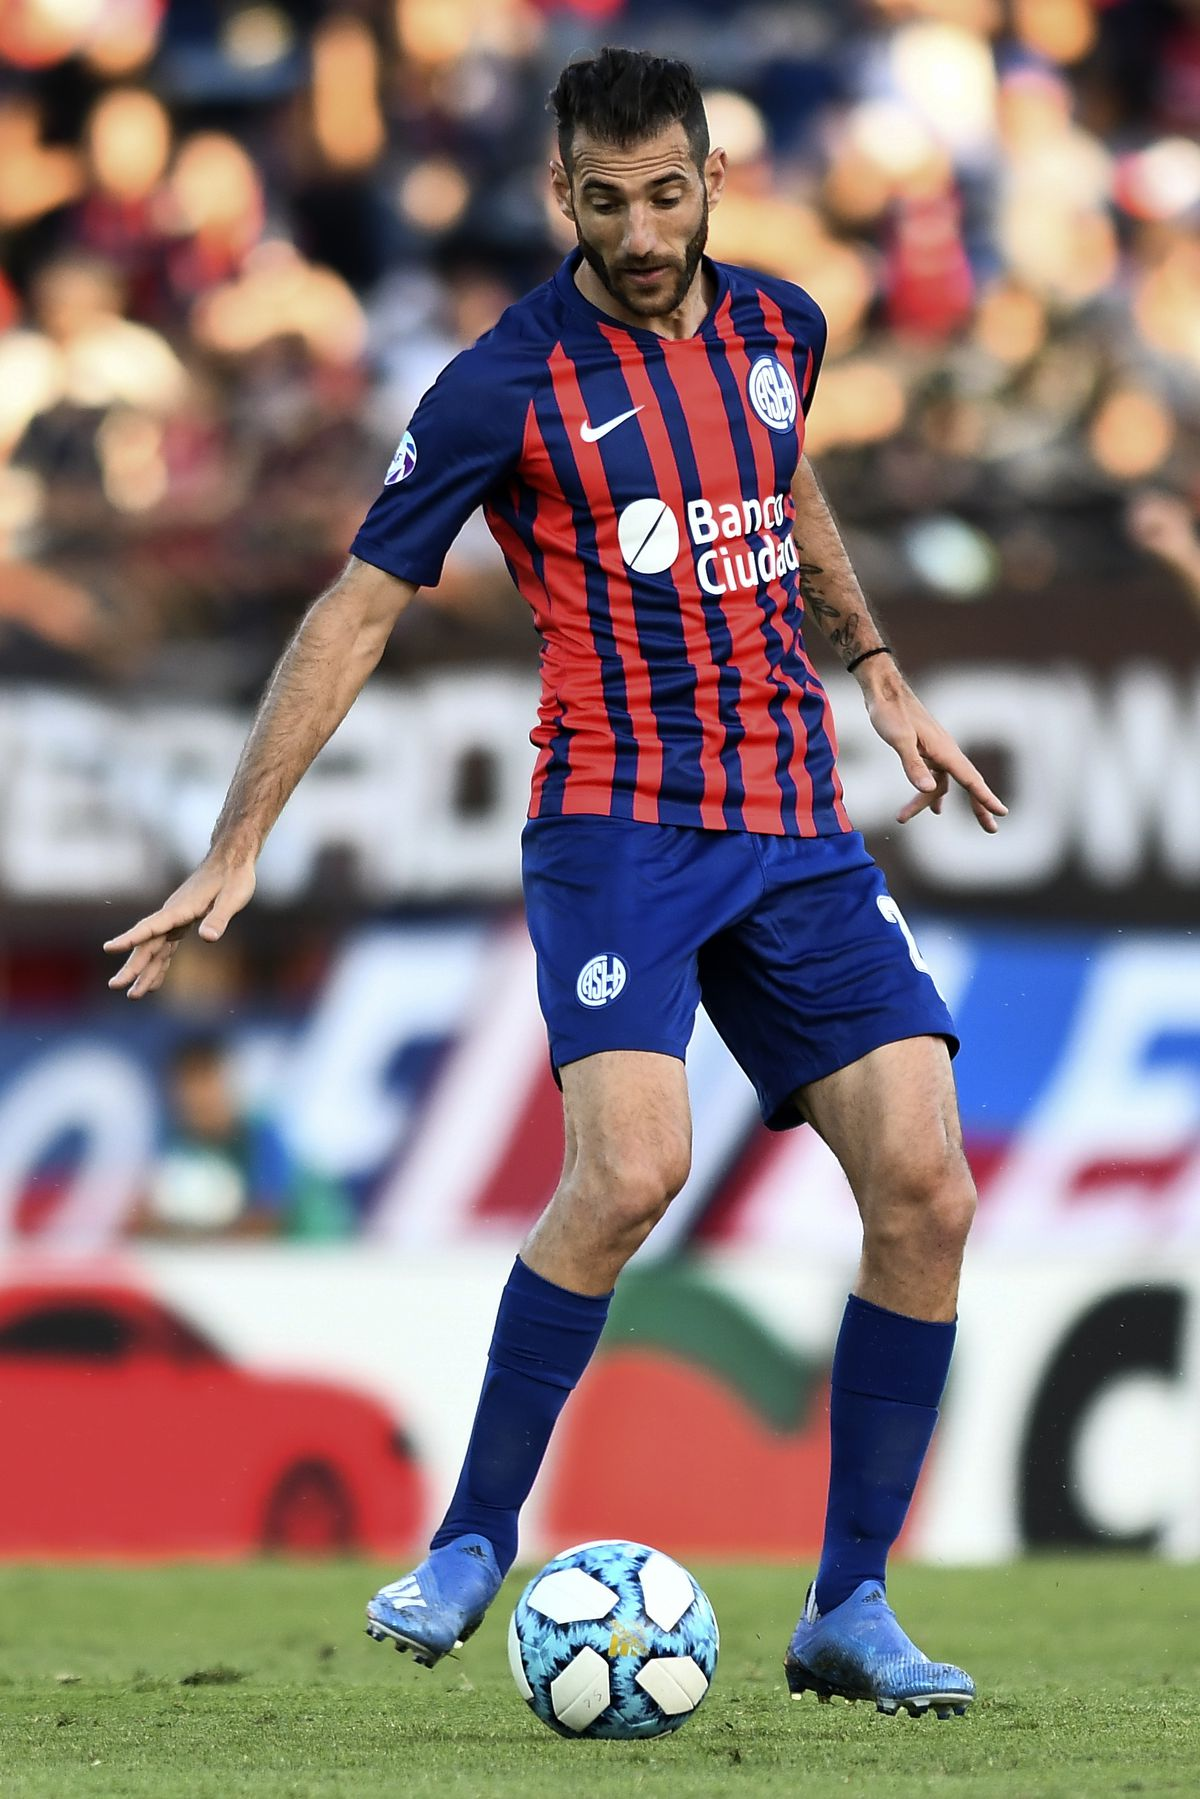 San Lorenzo v Racing Club - Superliga 2019/20